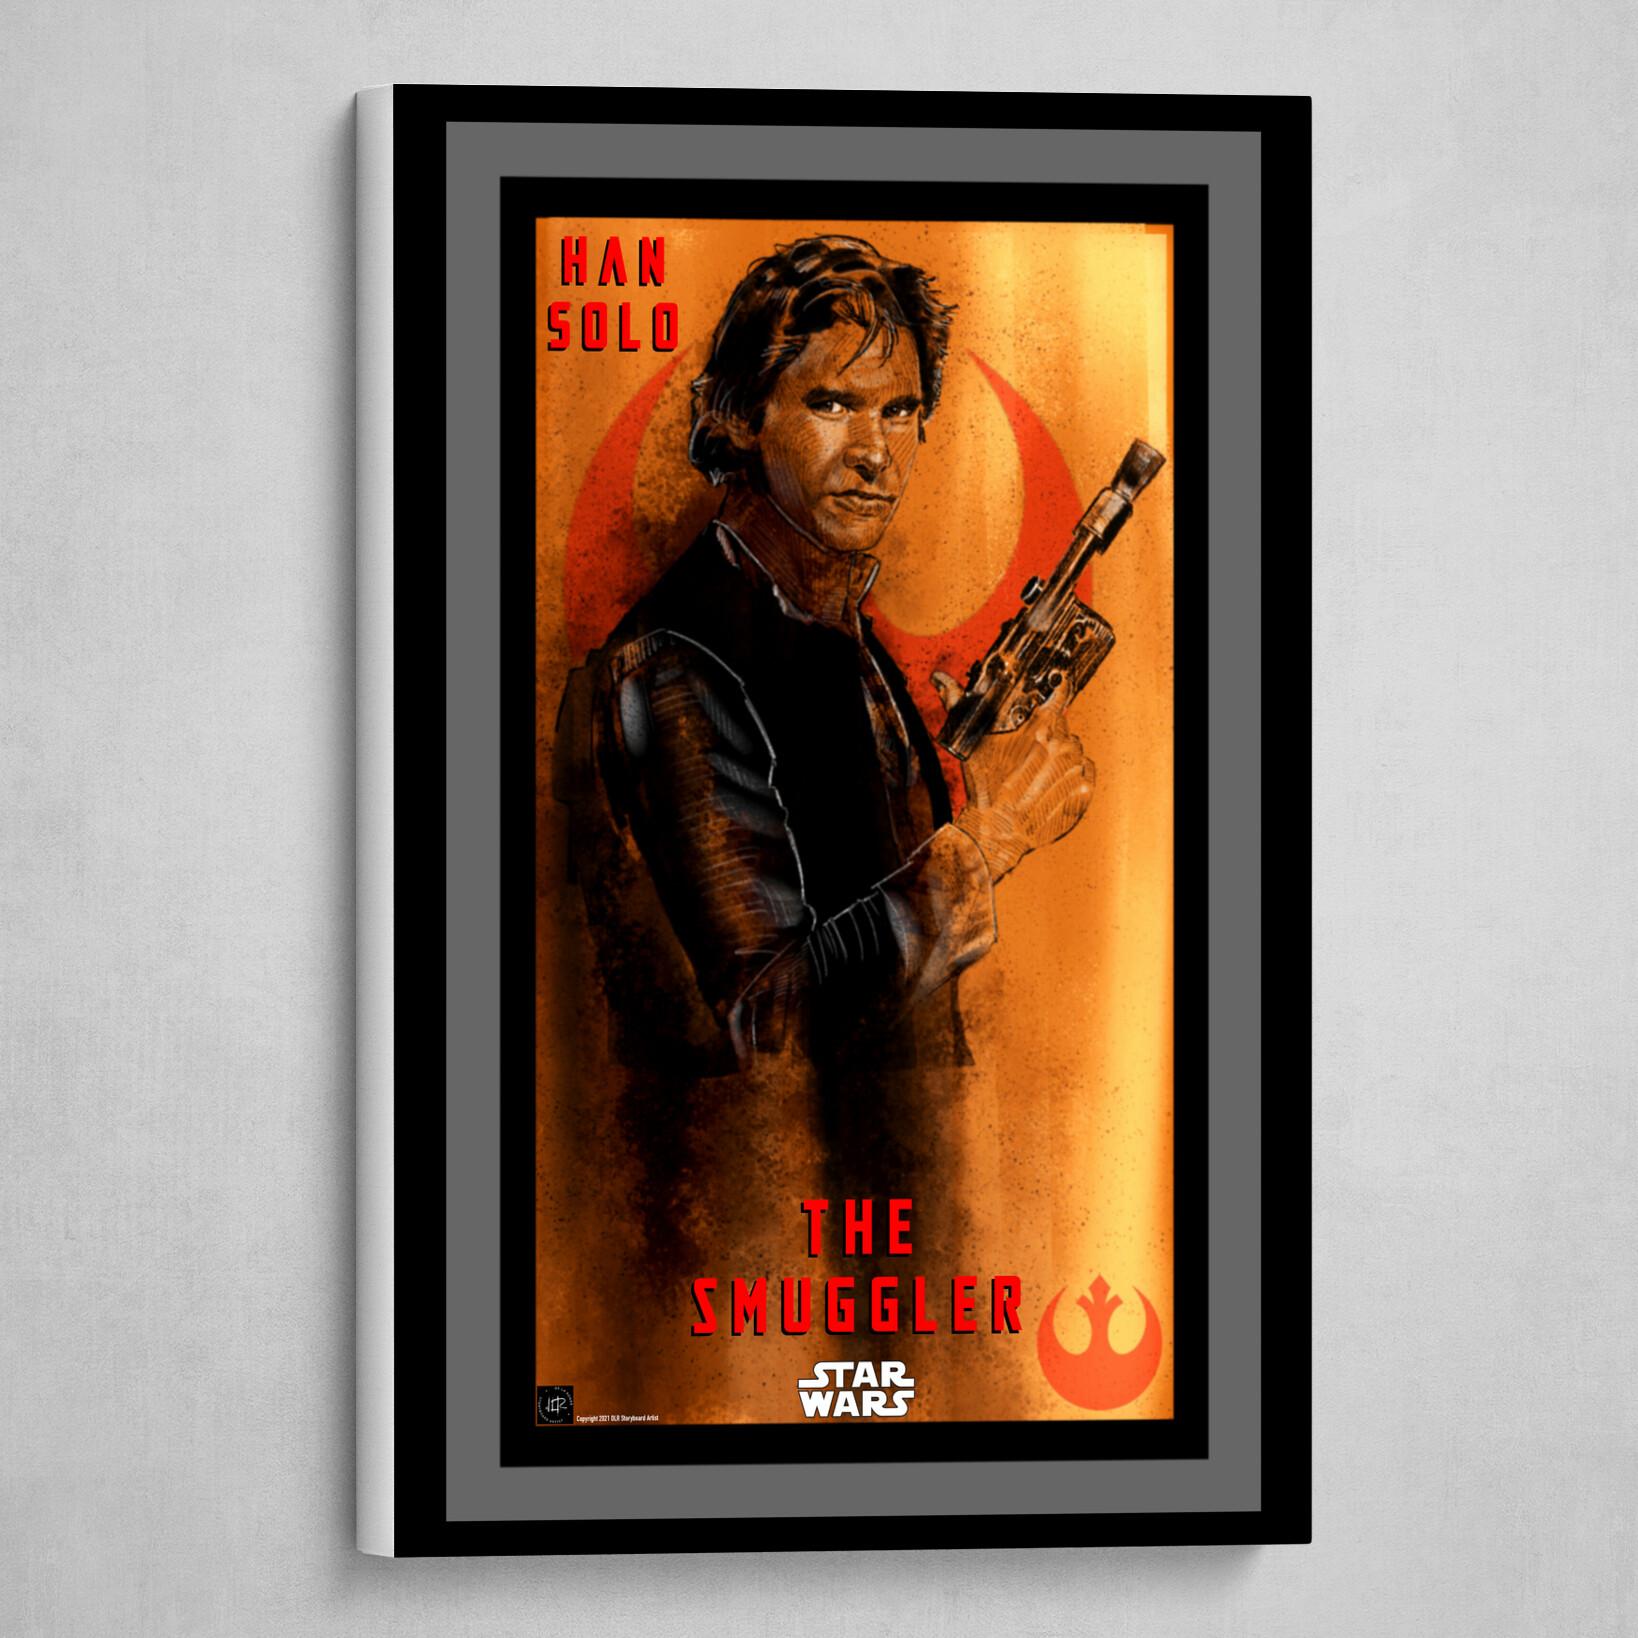 Han Solo-The Smuggler Poster